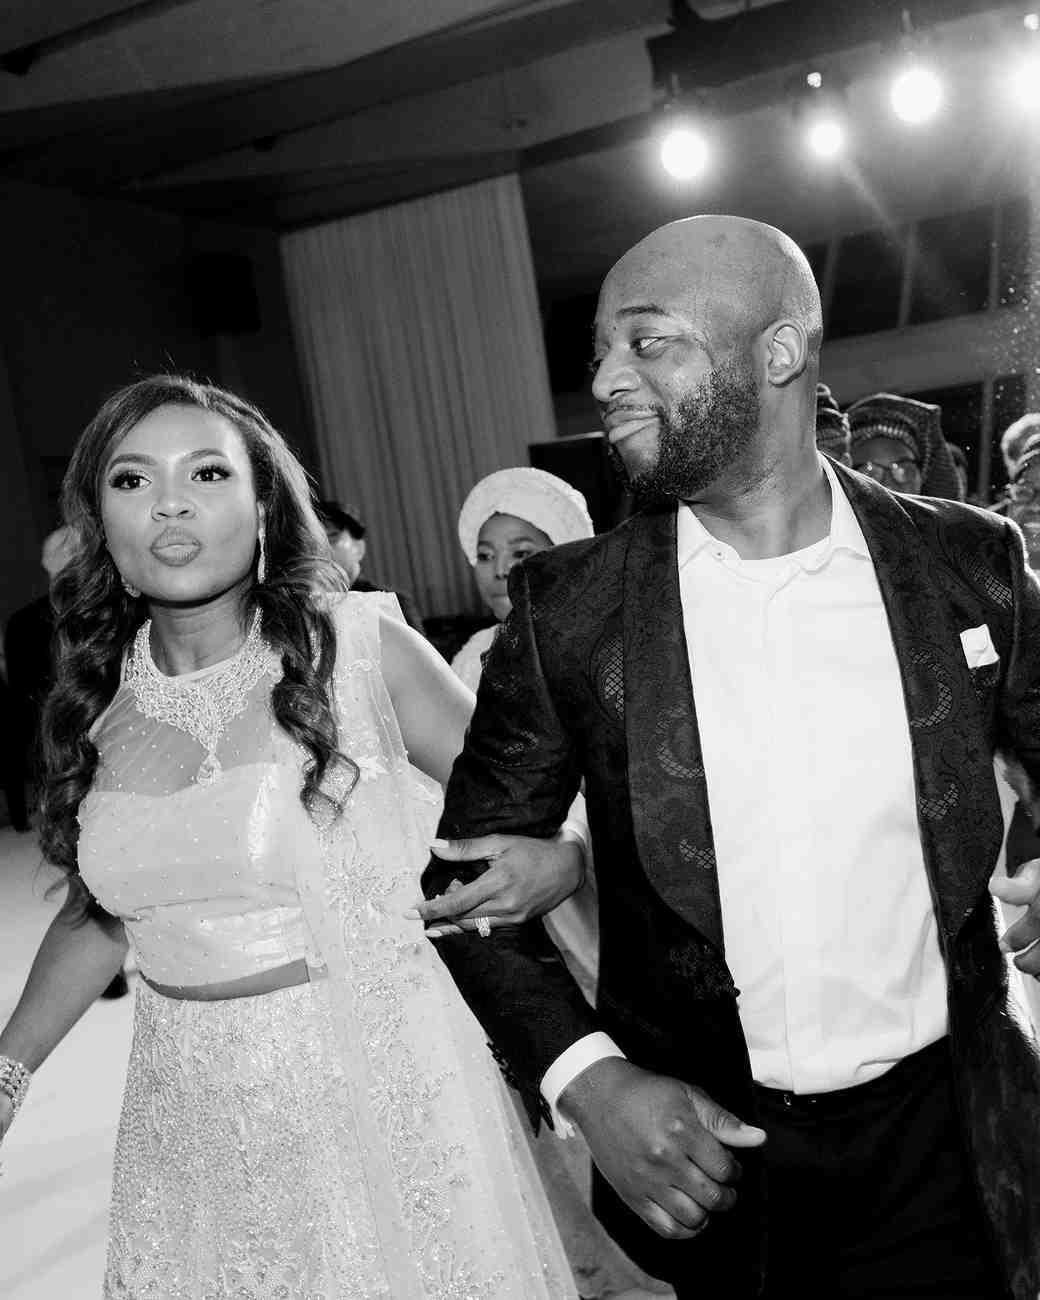 vanessa abidemi wedding couple at reception